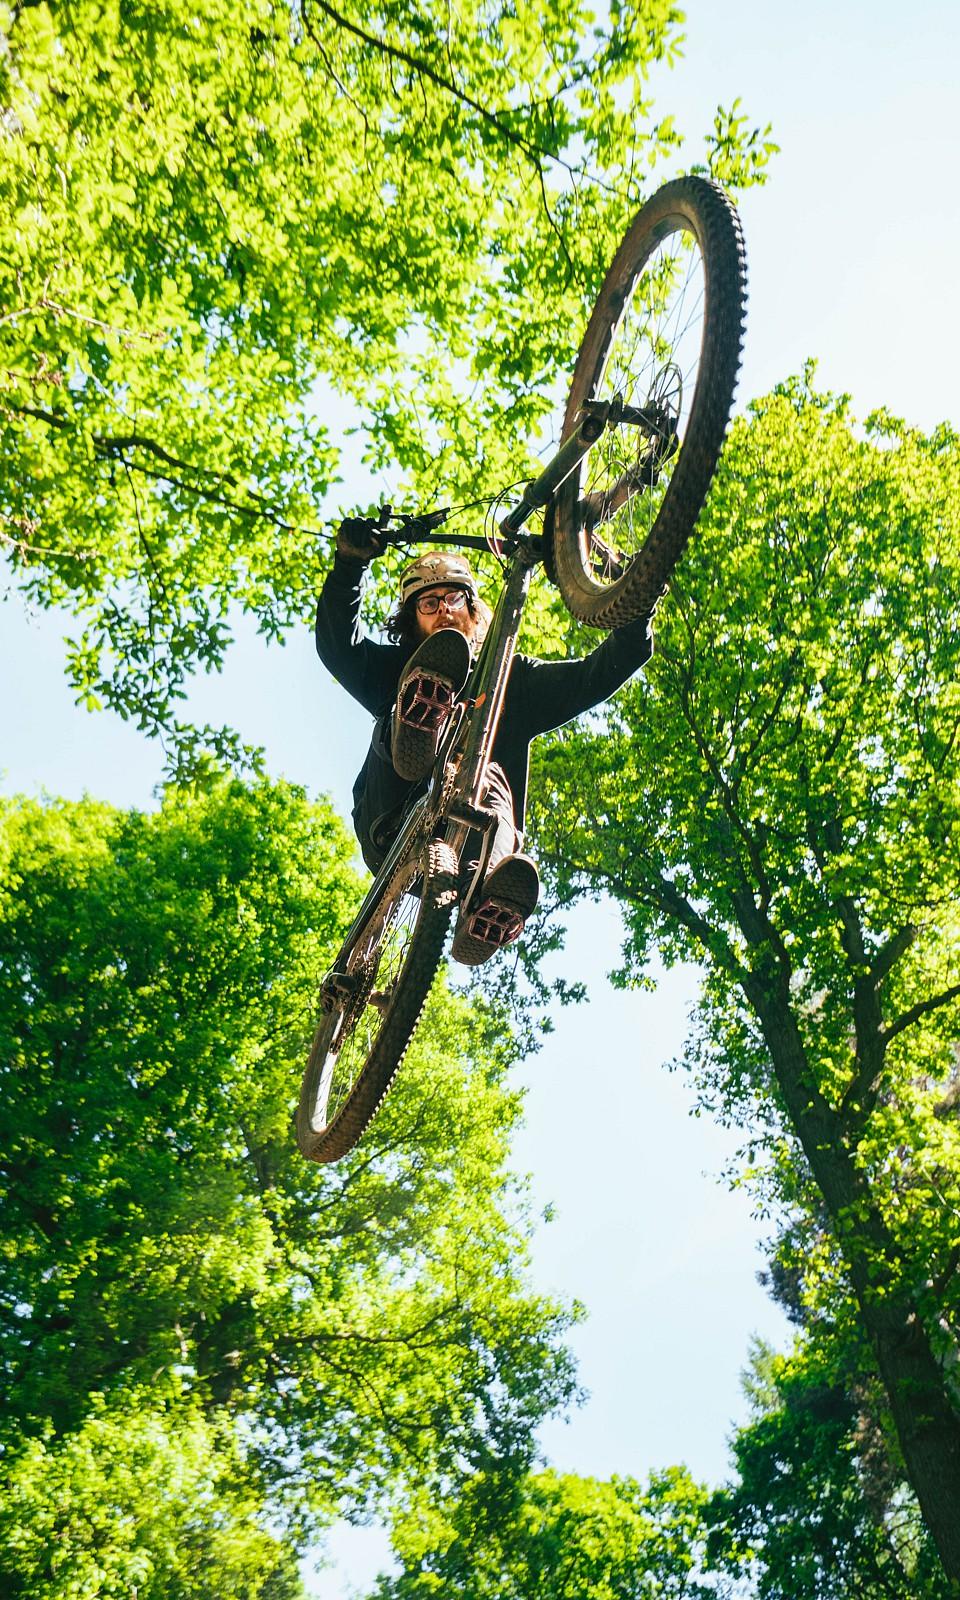 DSC03344 - Mushrum - Mountain Biking Pictures - Vital MTB